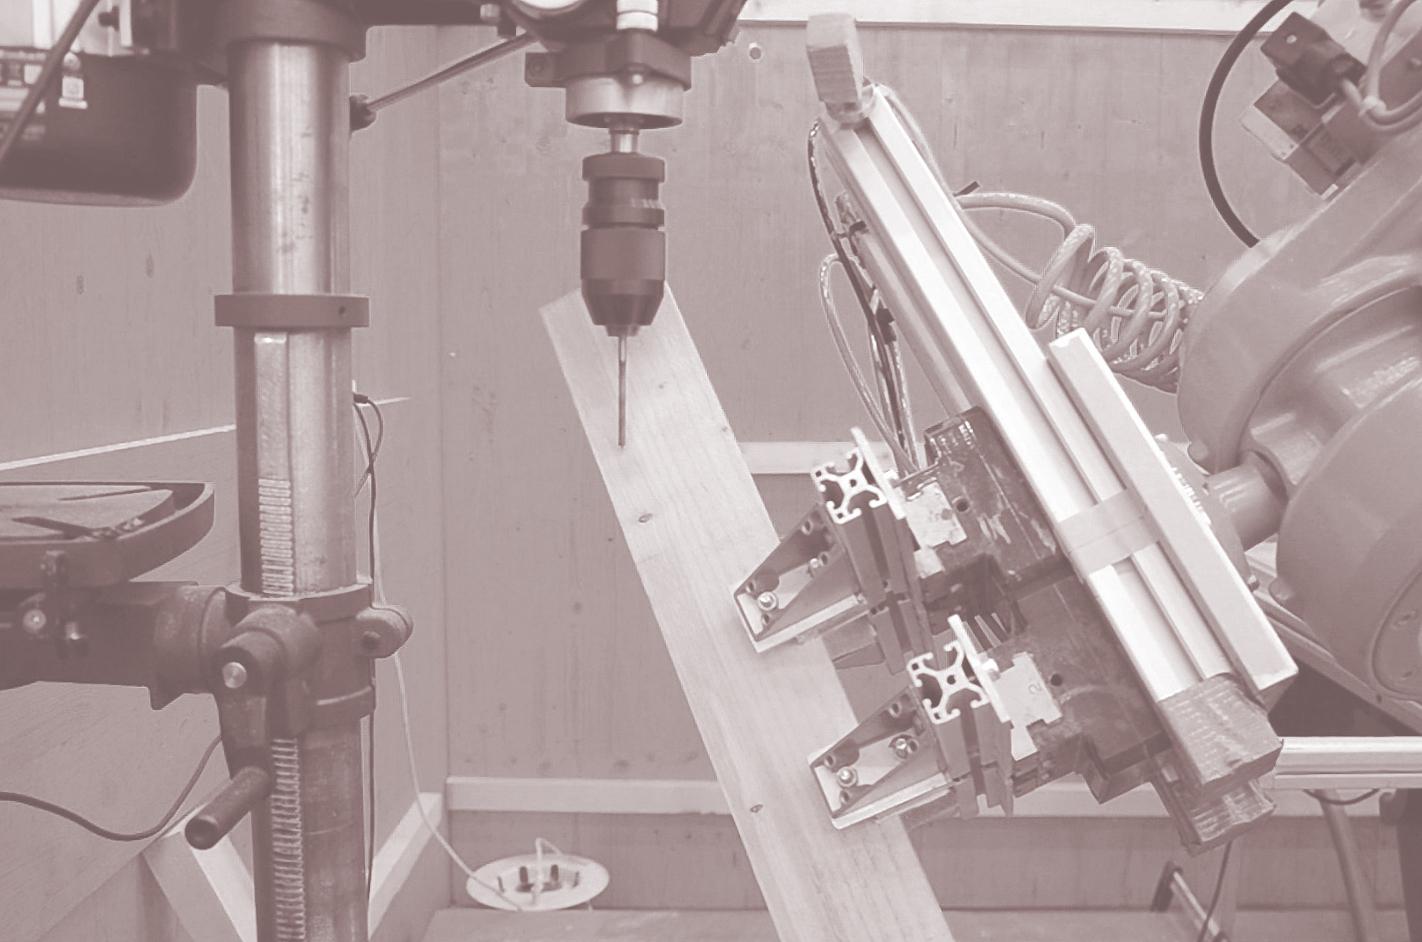 130625_167_RobotFabrication_0391_PR